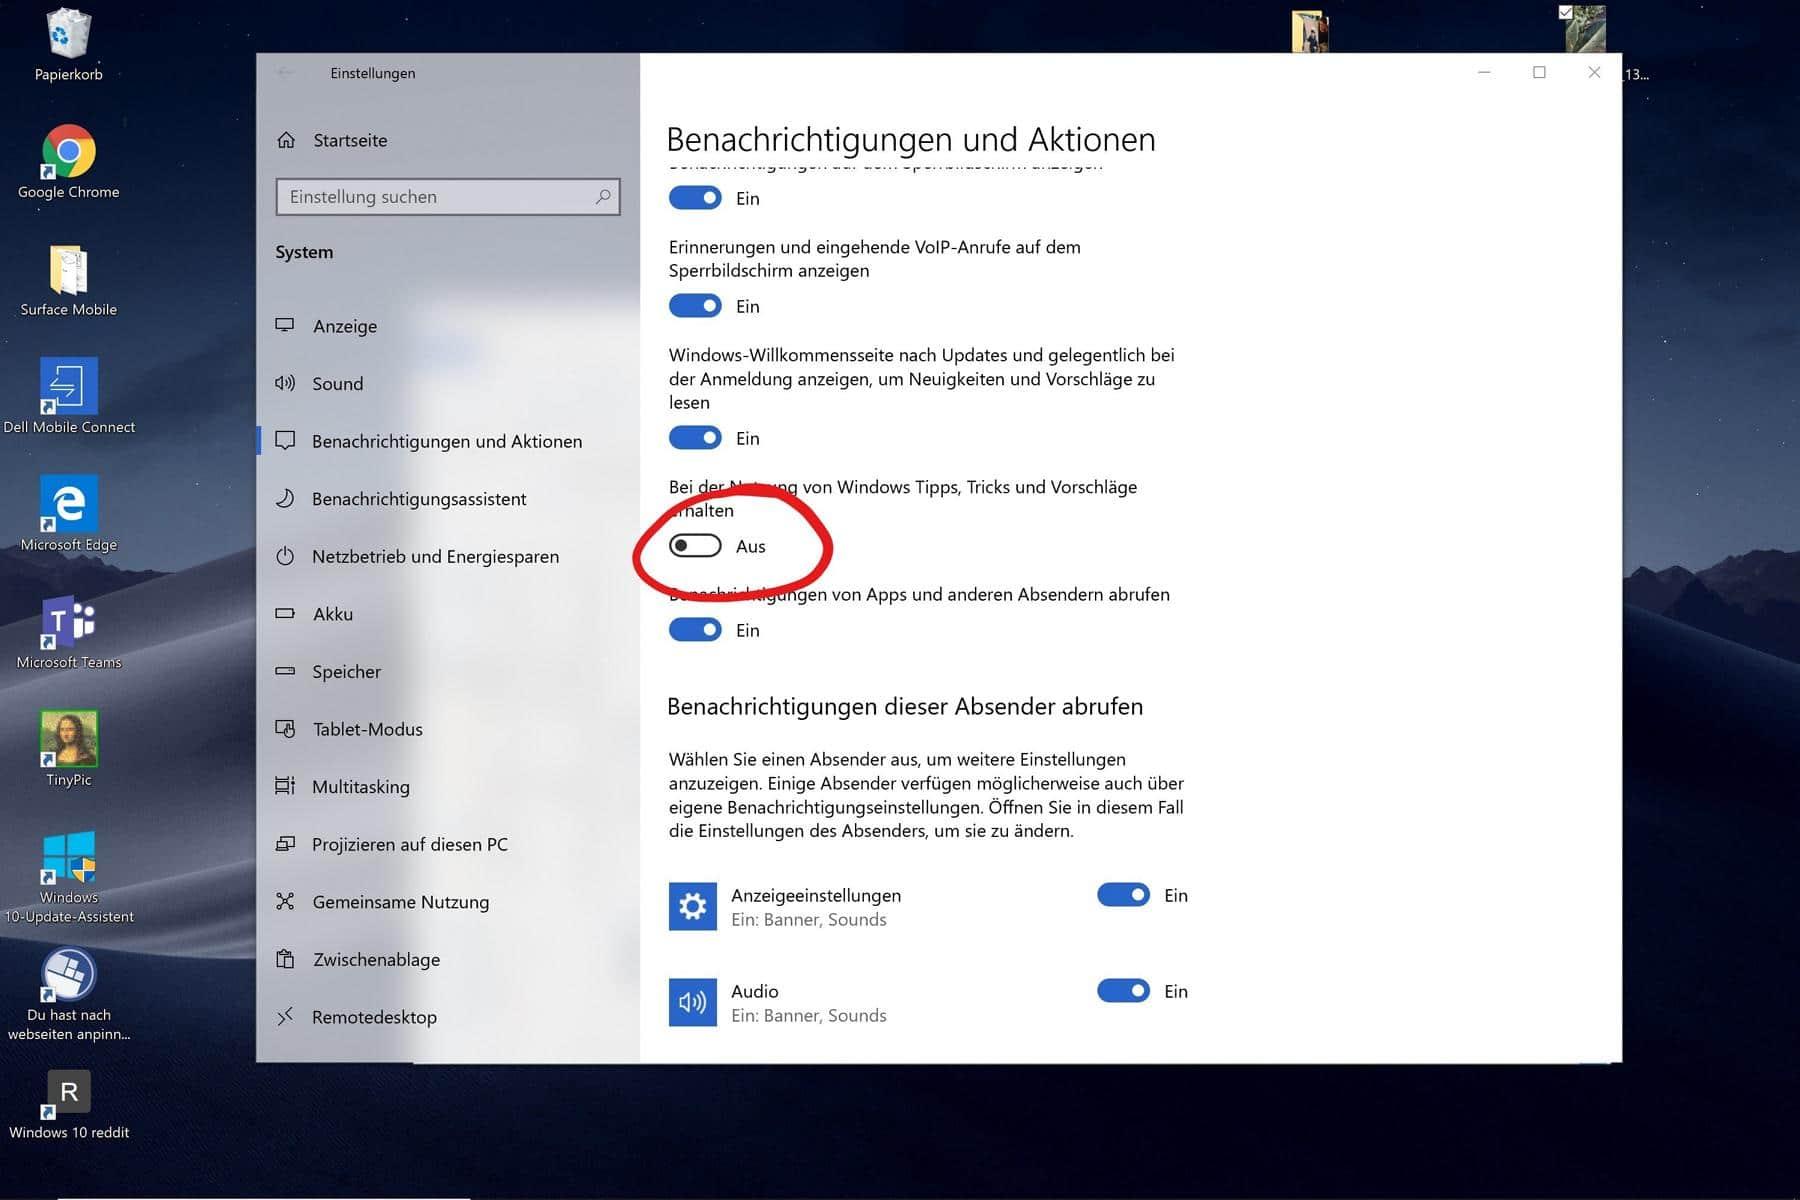 Windows 10 Info Center Werbung ausschalten